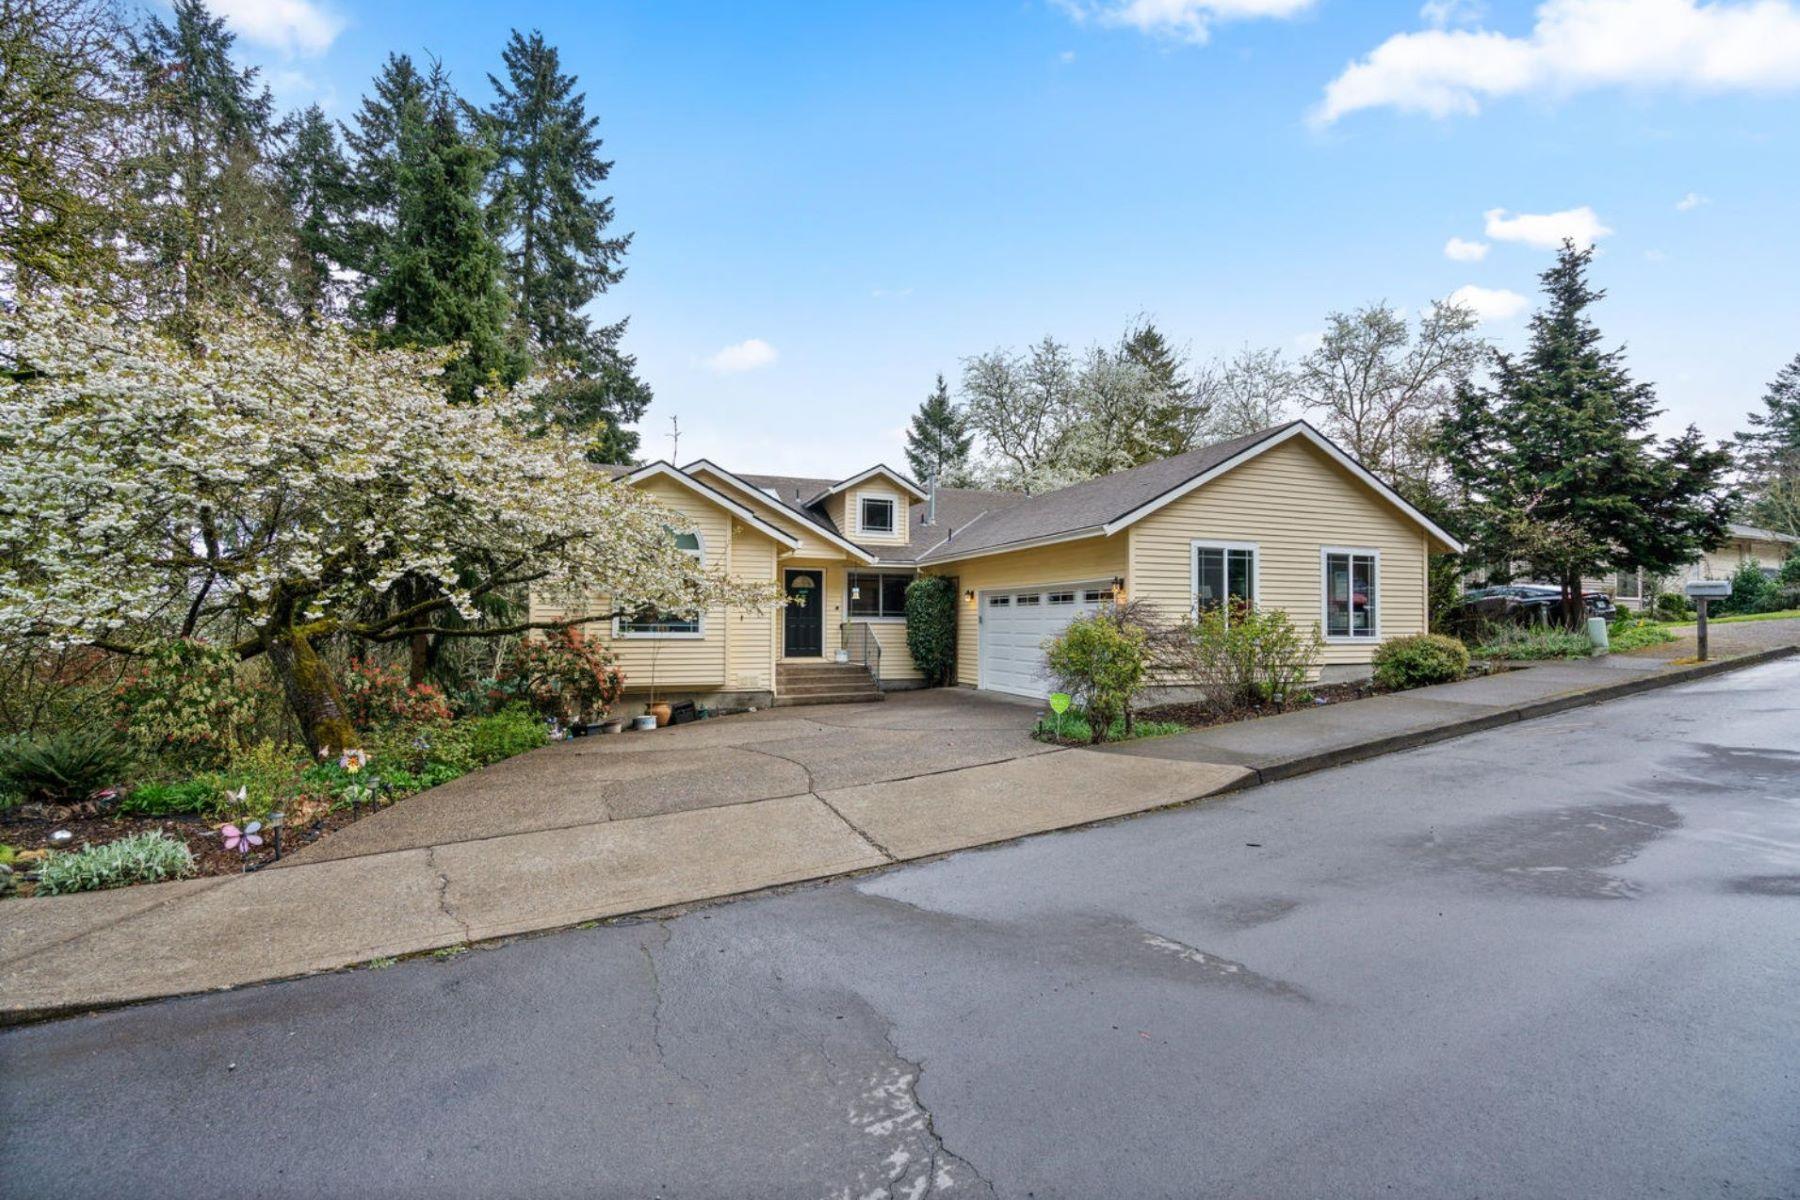 Other Residential Homes για την Πώληση στο 17887 HILLSIDE DR West Linn, OR 97068 West Linn, Ορεγκον 97068 Ηνωμένες Πολιτείες